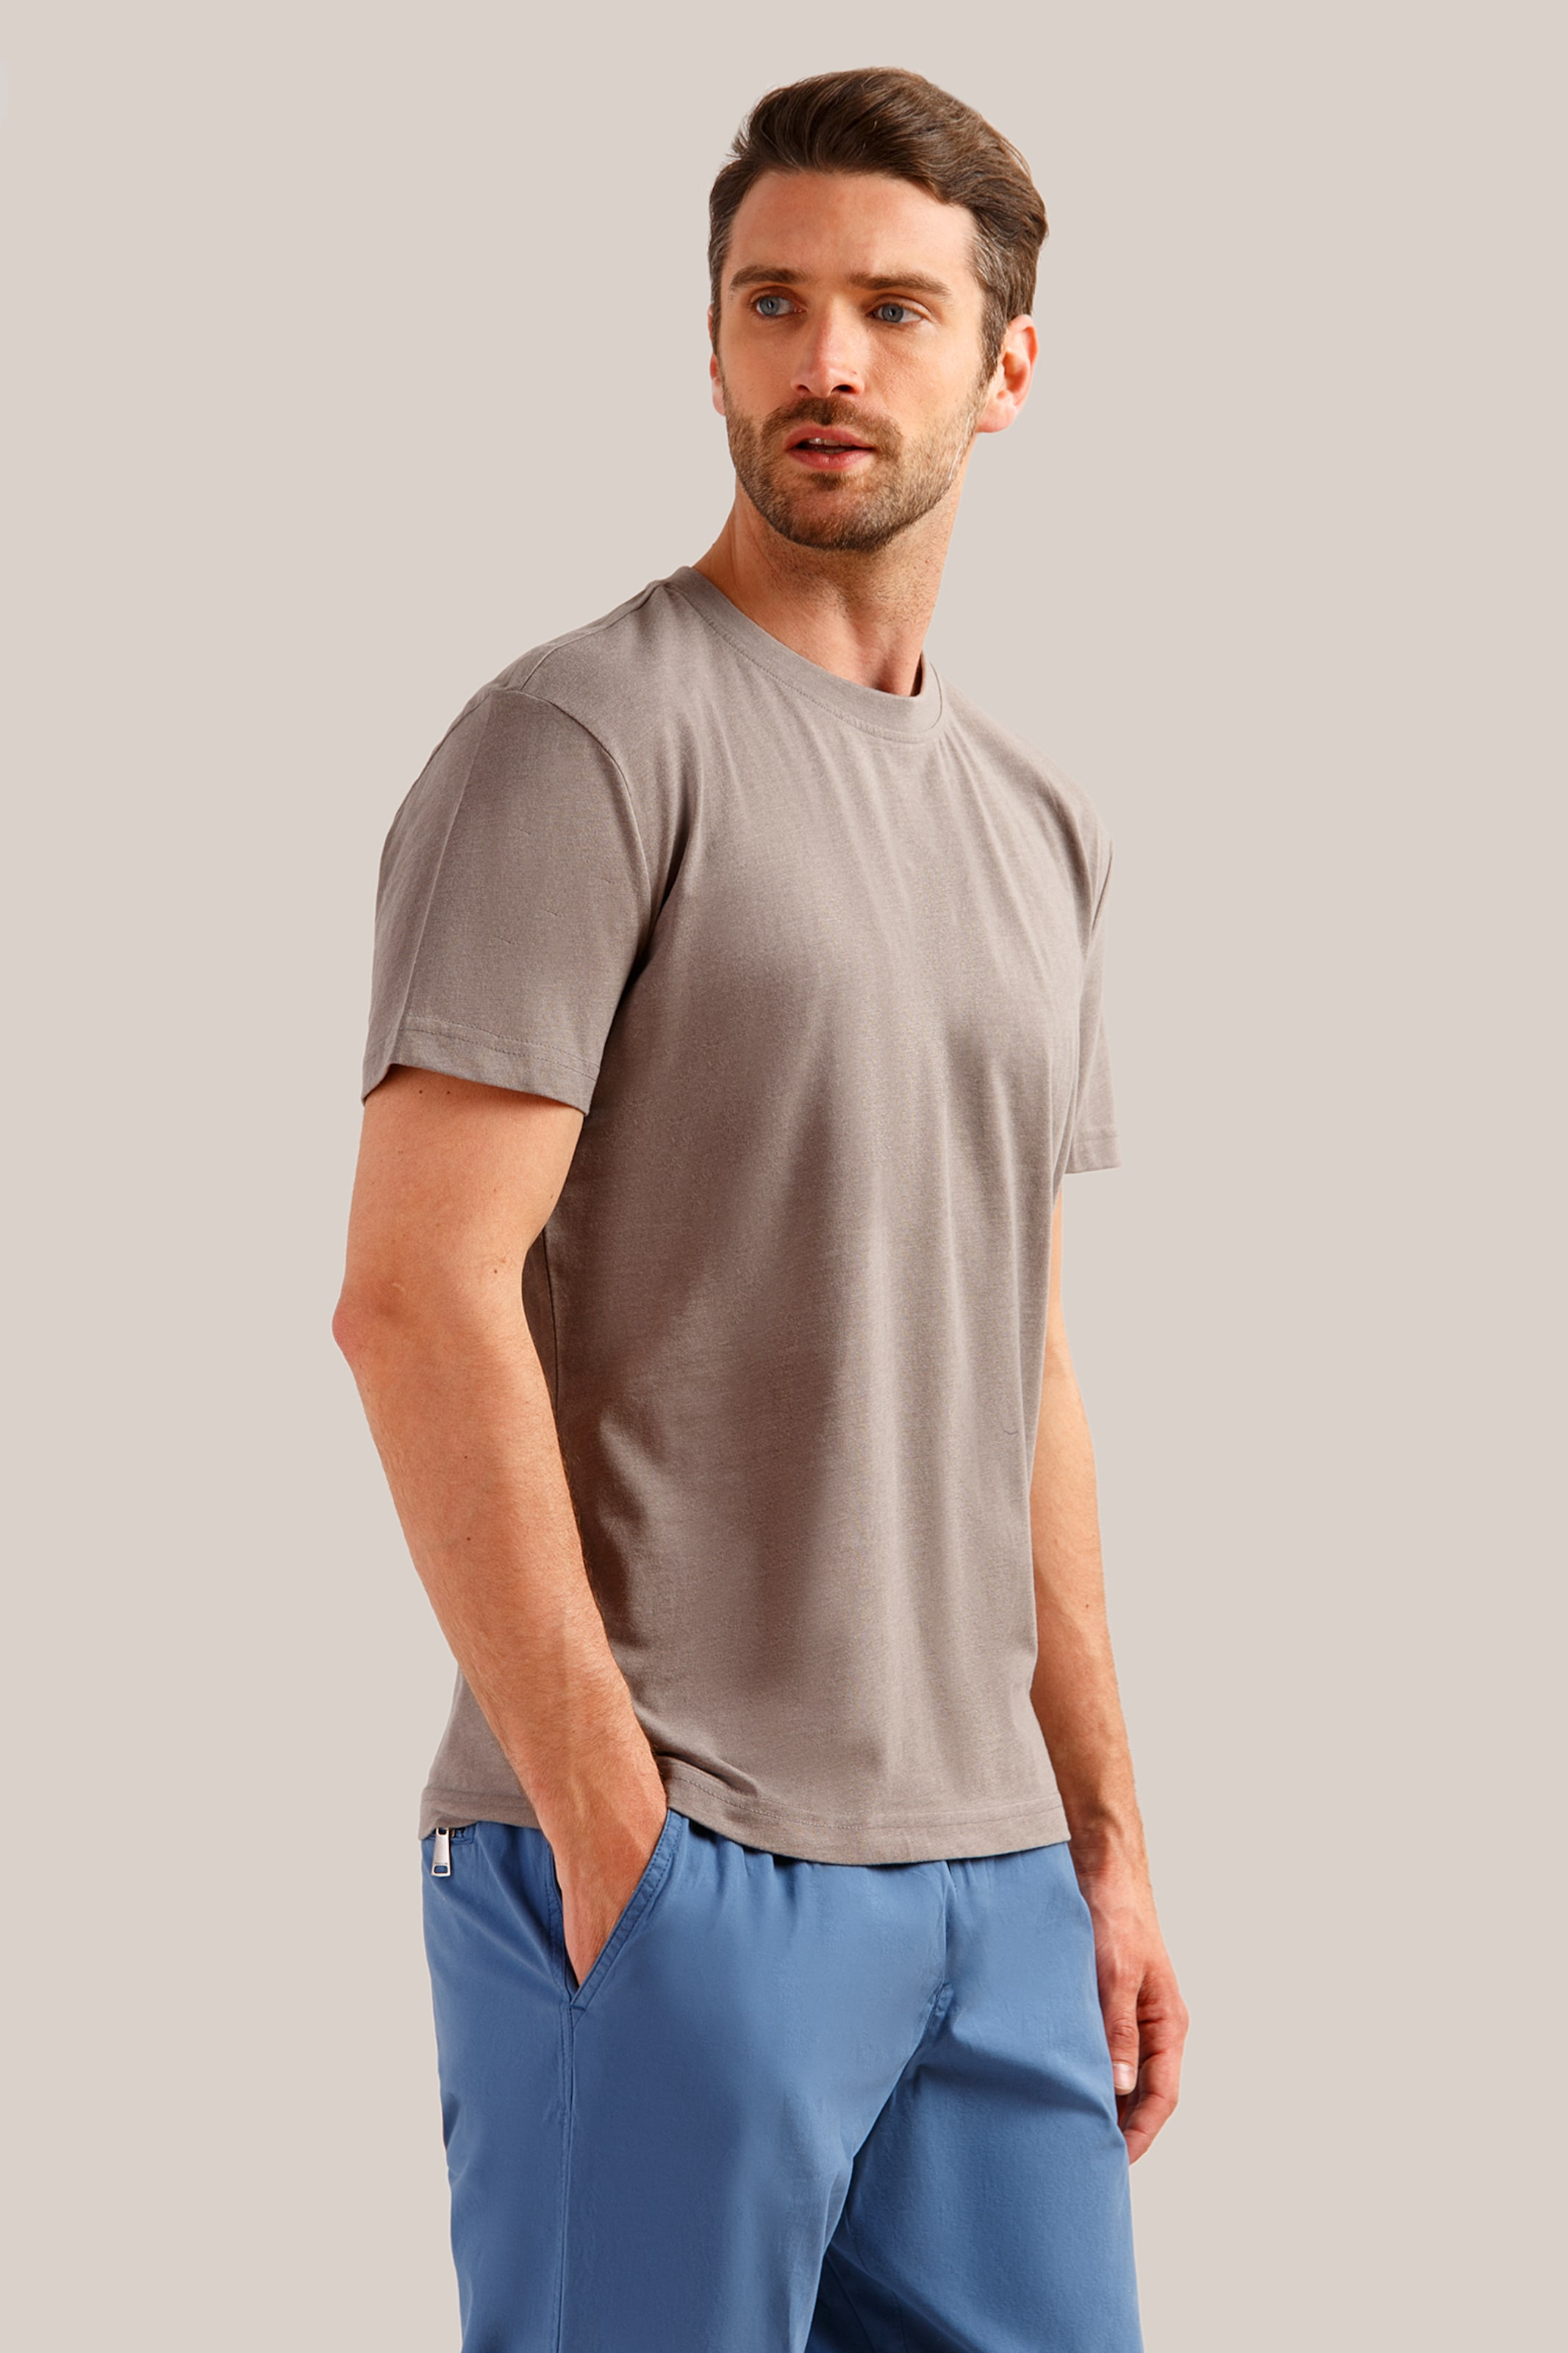 In Design shirt Finn Flare Basic Braun Klassischem Yb7gIfv6y